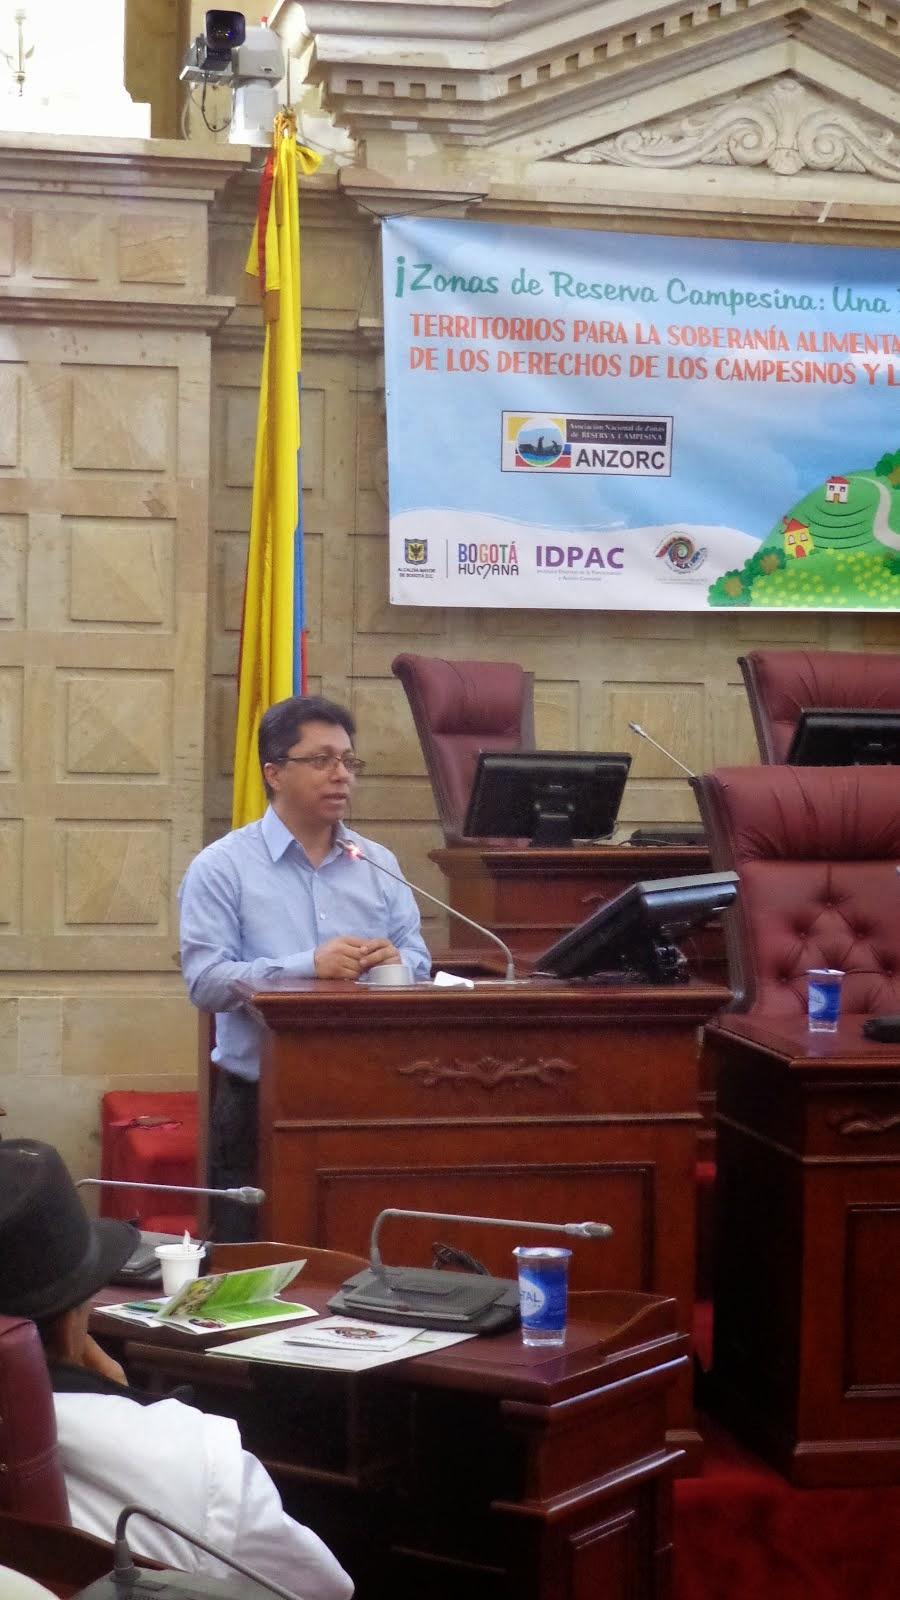 Presentación de ponencia en Seminario Internacional de Zonas de Reserva Campesina.